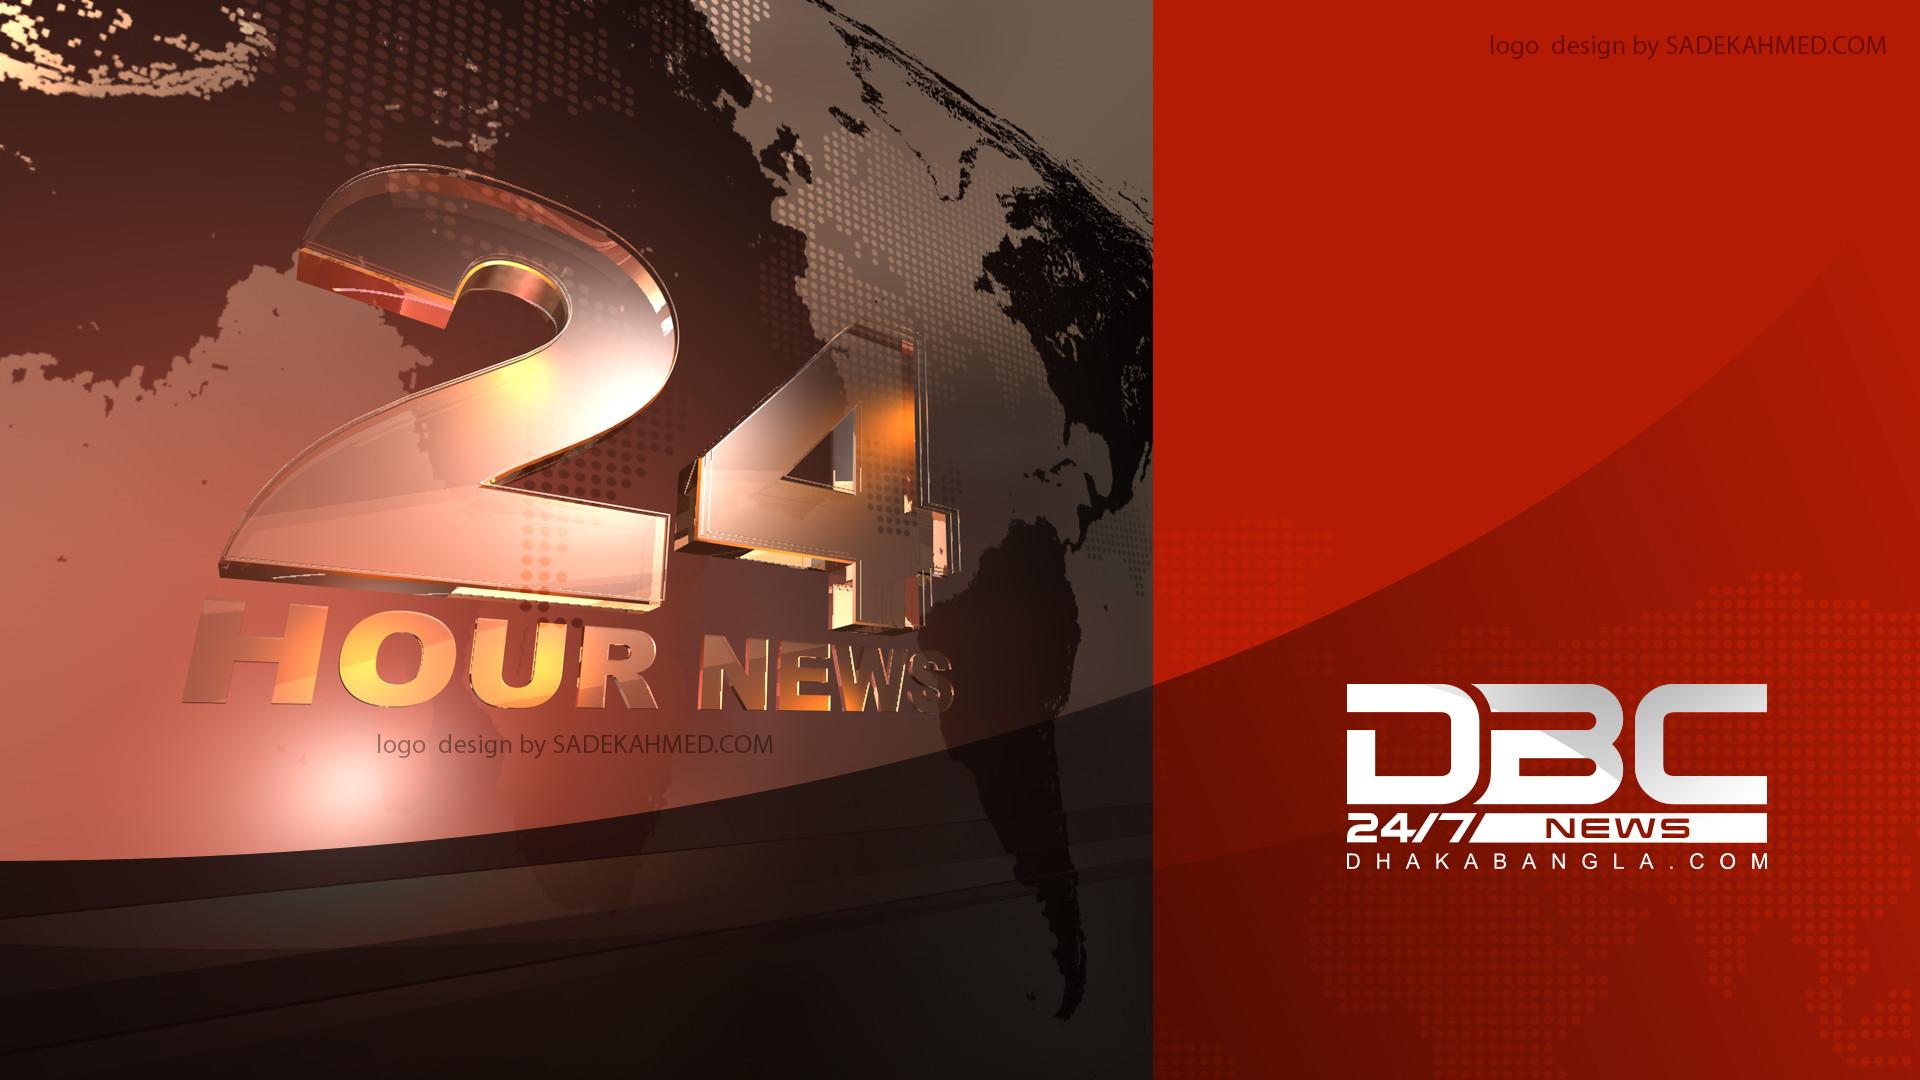 ArtStation - DBC NEWS | DHAKA, BANGLADESH | logo design by